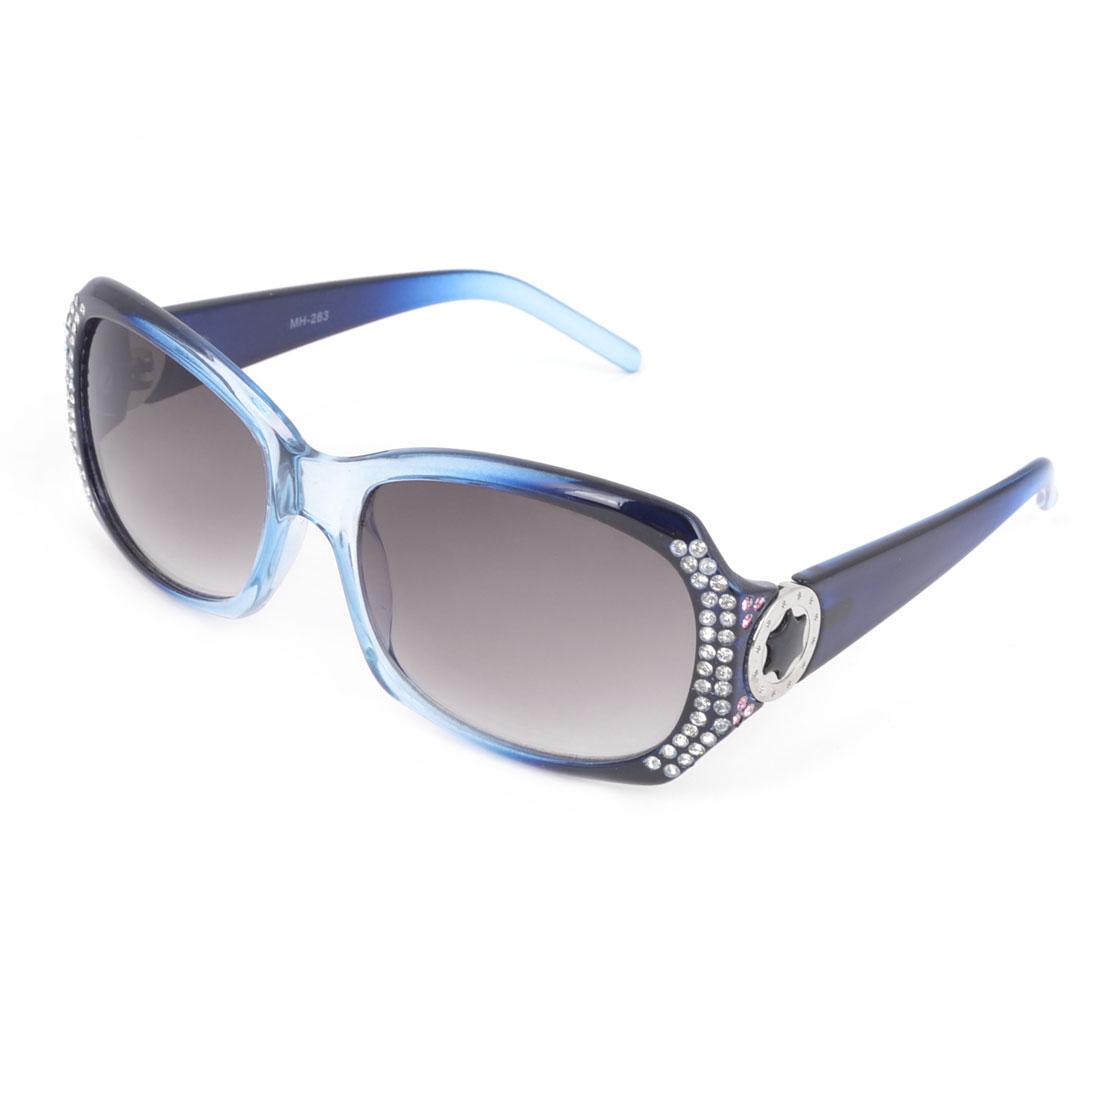 Ladies Blue Plastic Full Rim Gray Rectangle Lens Sunglasses Glasses